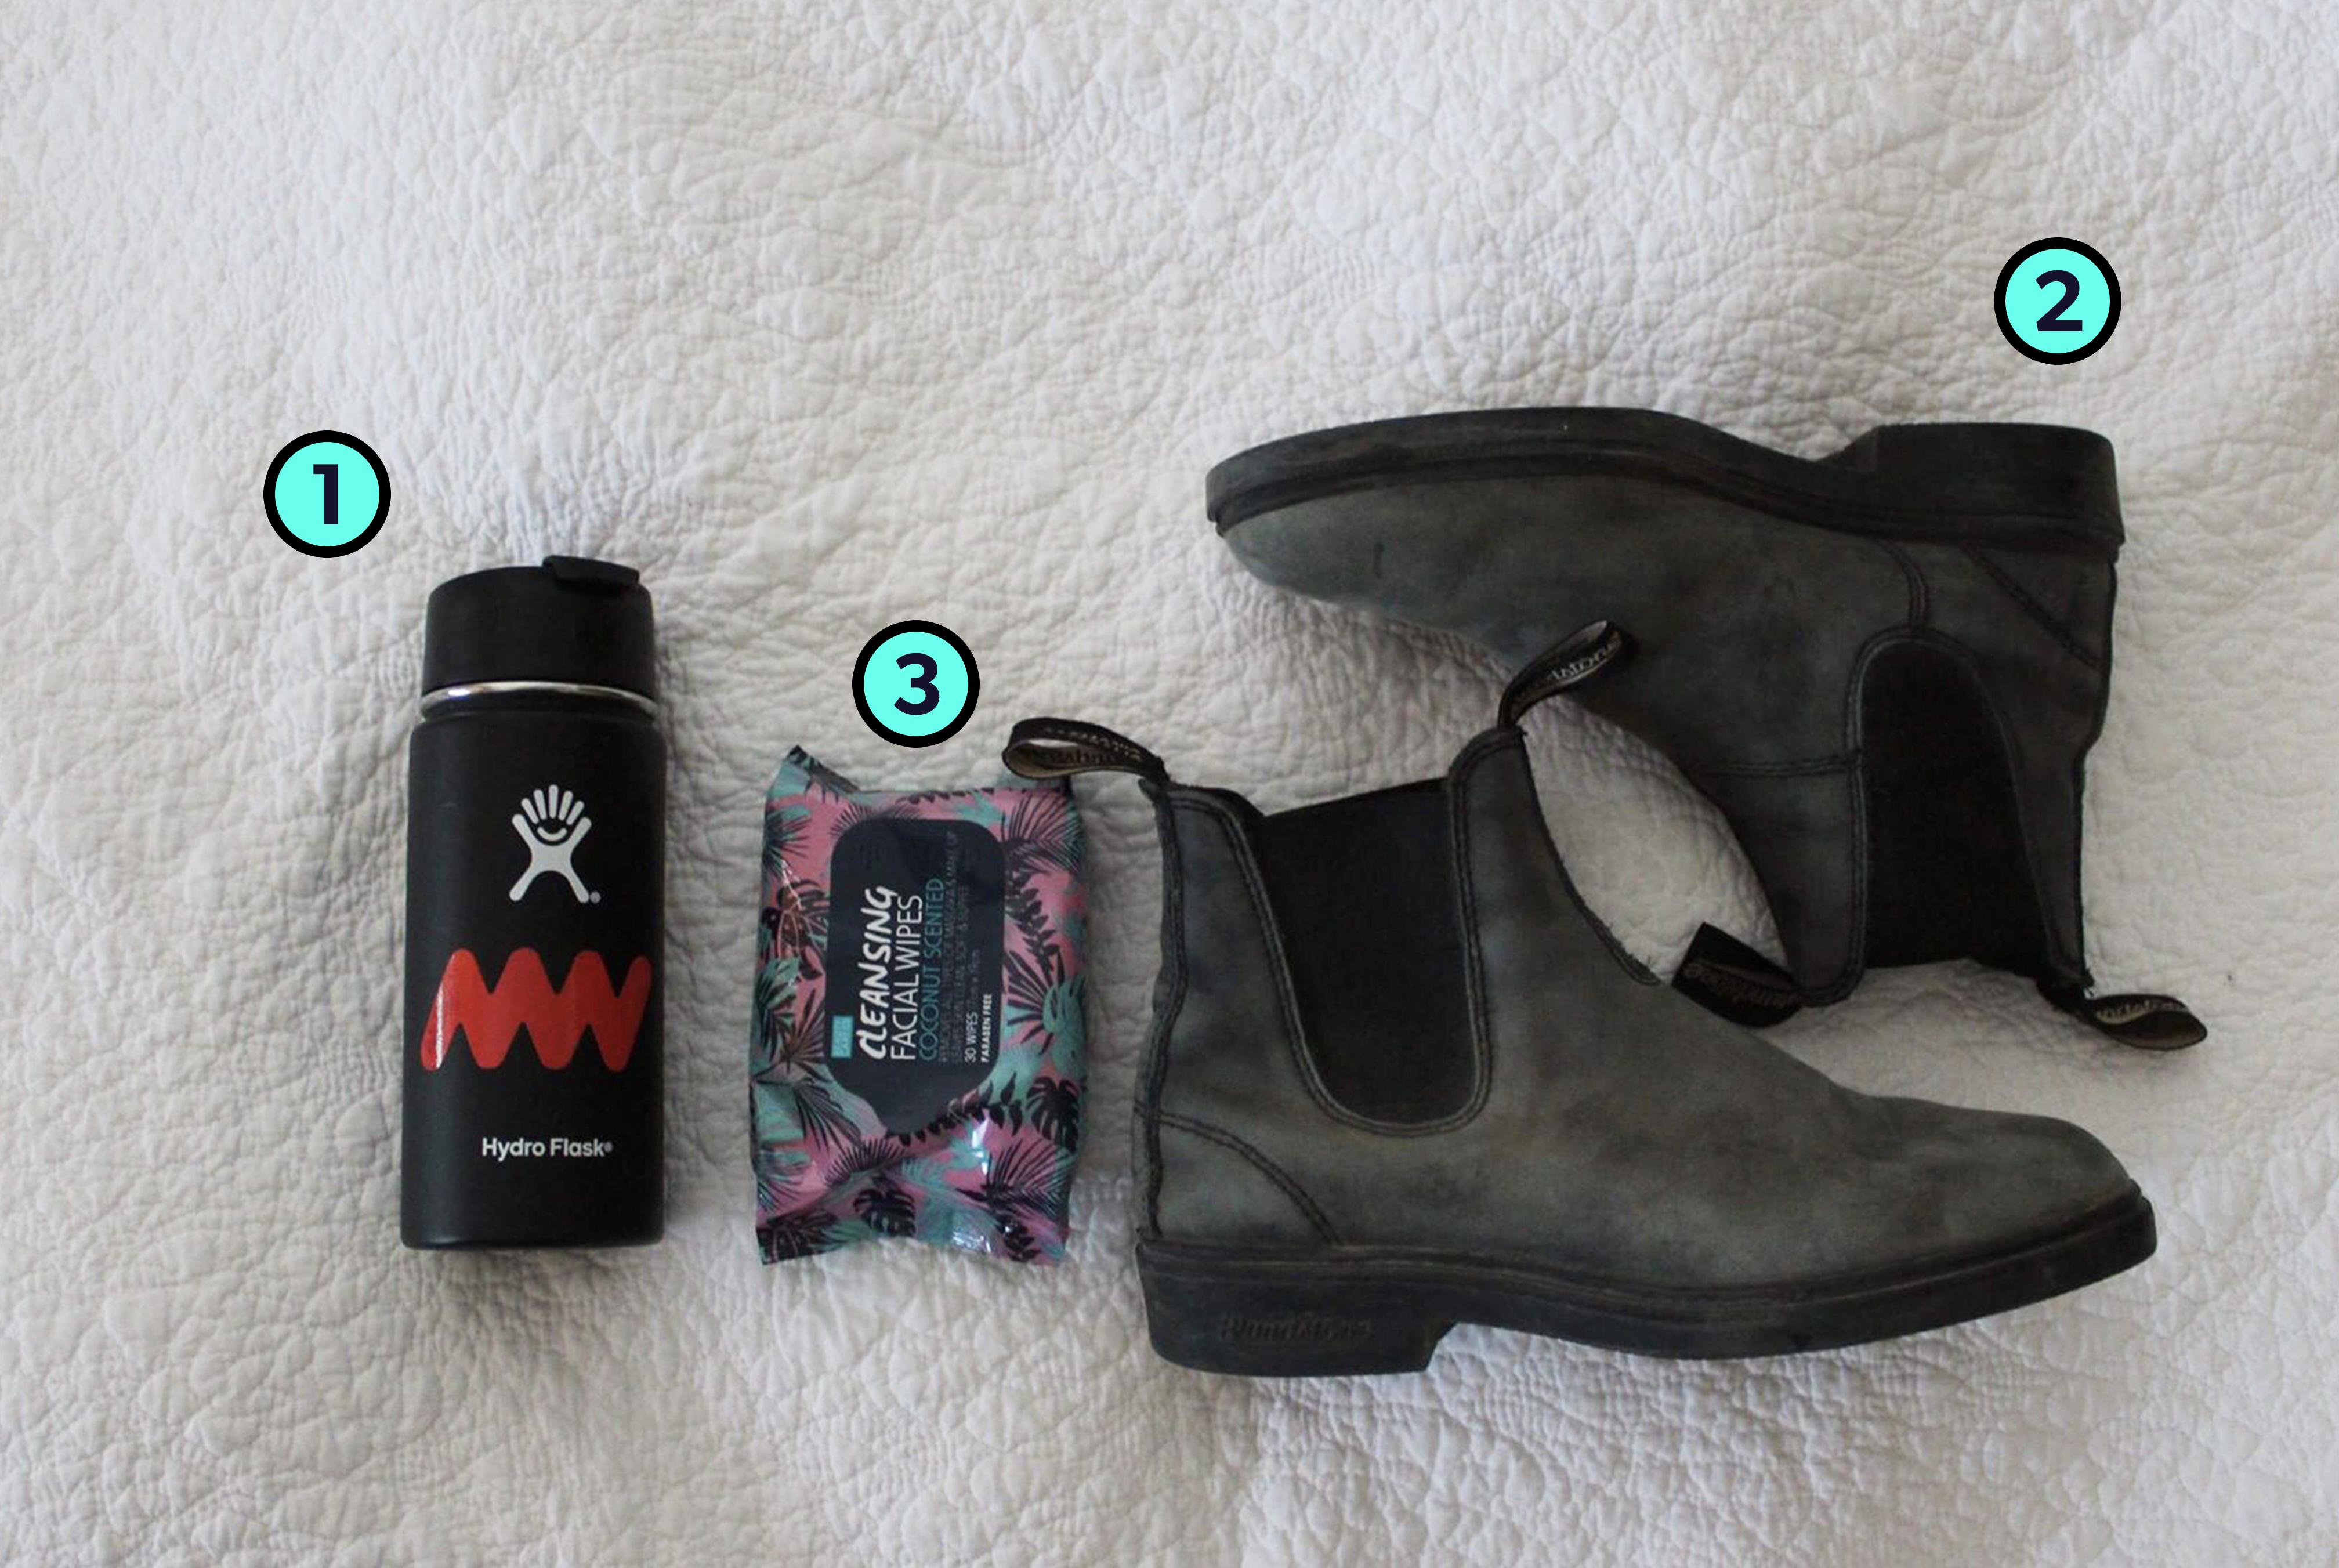 Abby McNeill's Trusty Travel Items